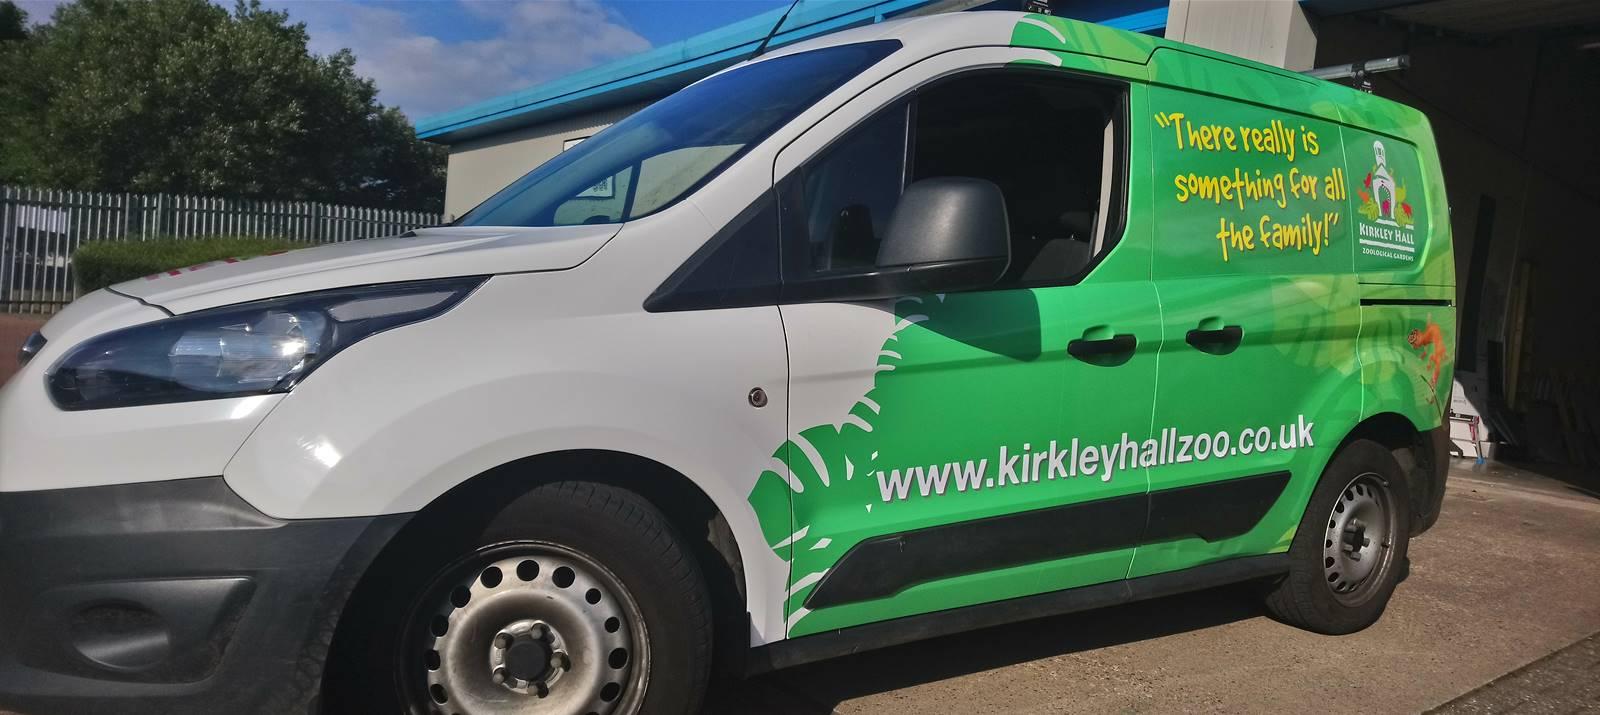 Van livery for Kirkley Hall Zoological Gardens